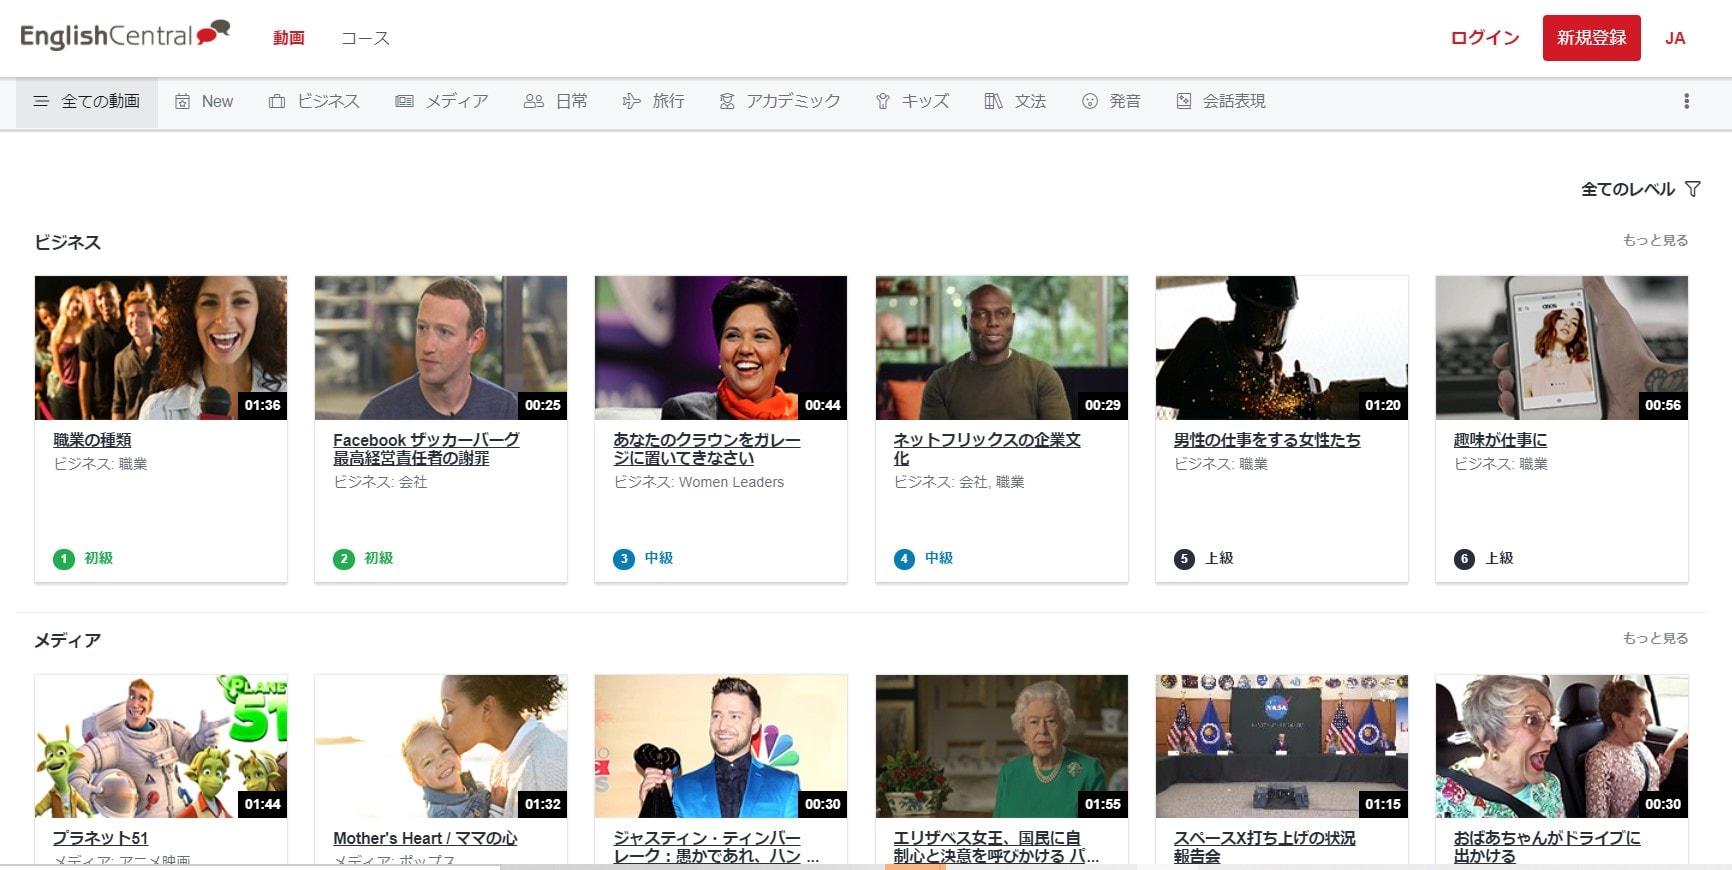 Englishcentralの最大の特徴は15,400以上の動画教材